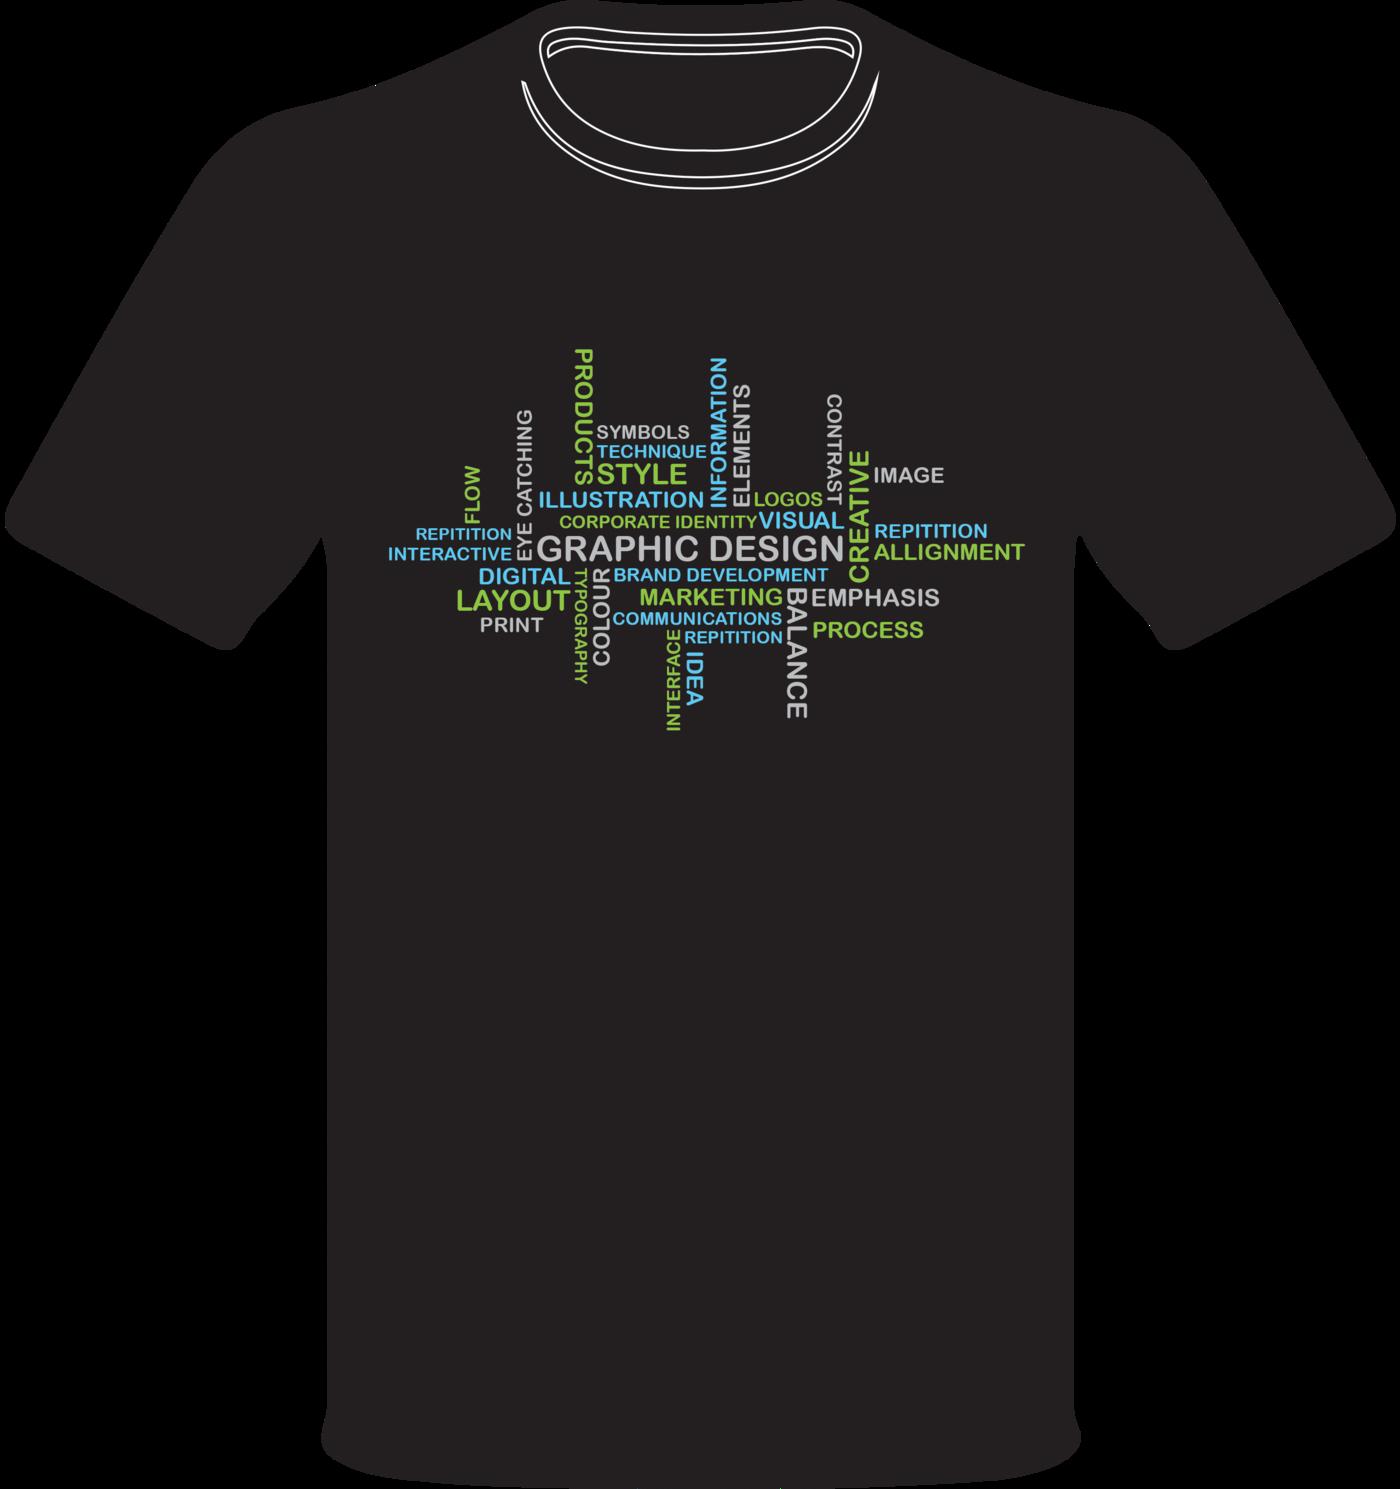 Graphic Design T Shirt Designs By Ashlyn Parker At Coroflot